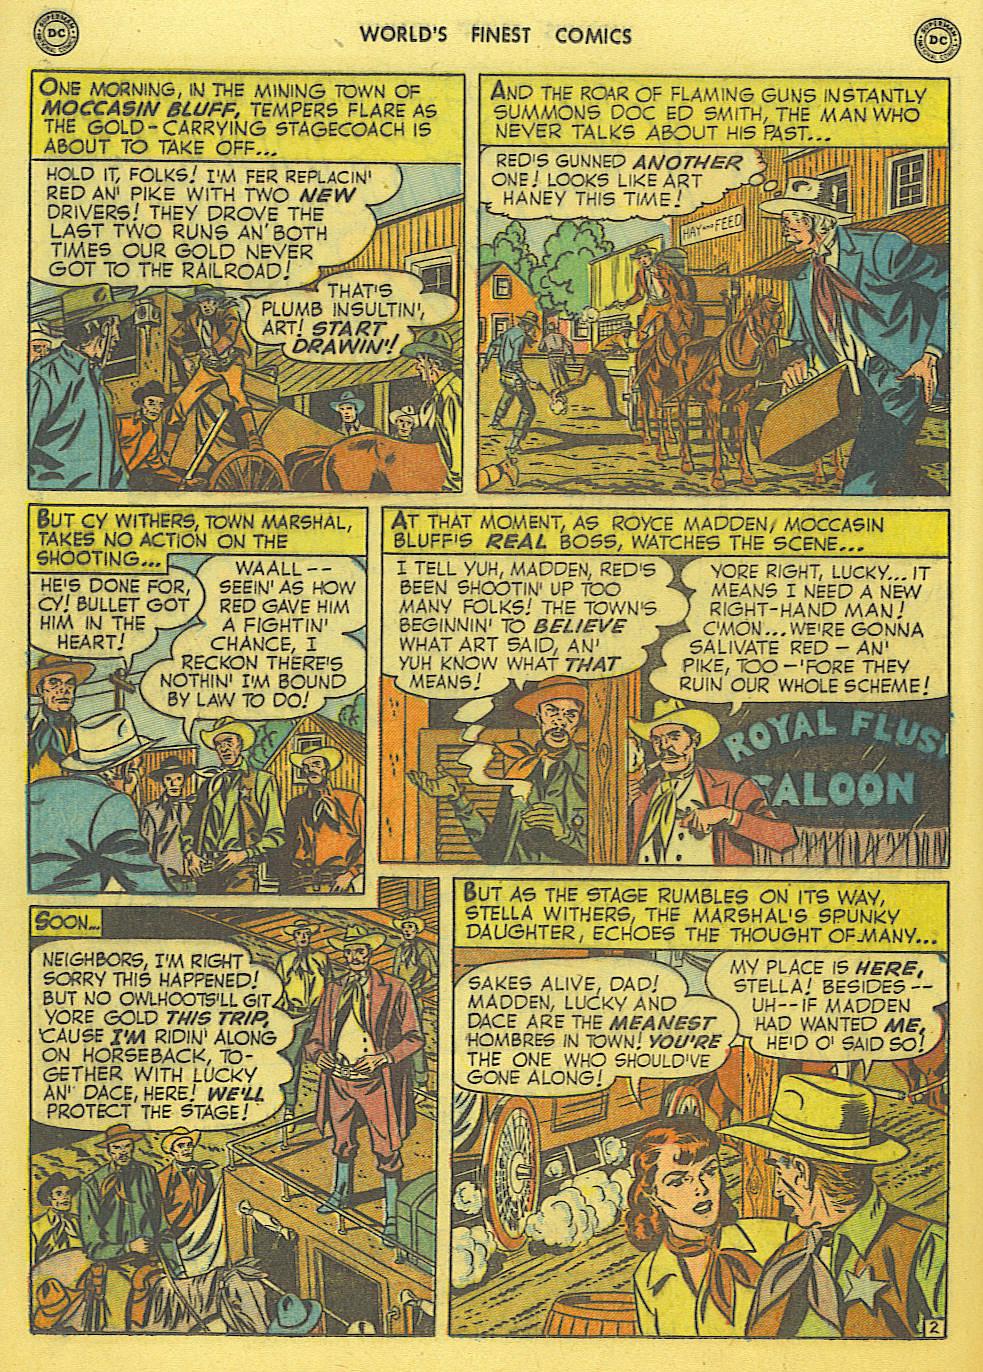 Read online World's Finest Comics comic -  Issue #49 - 41